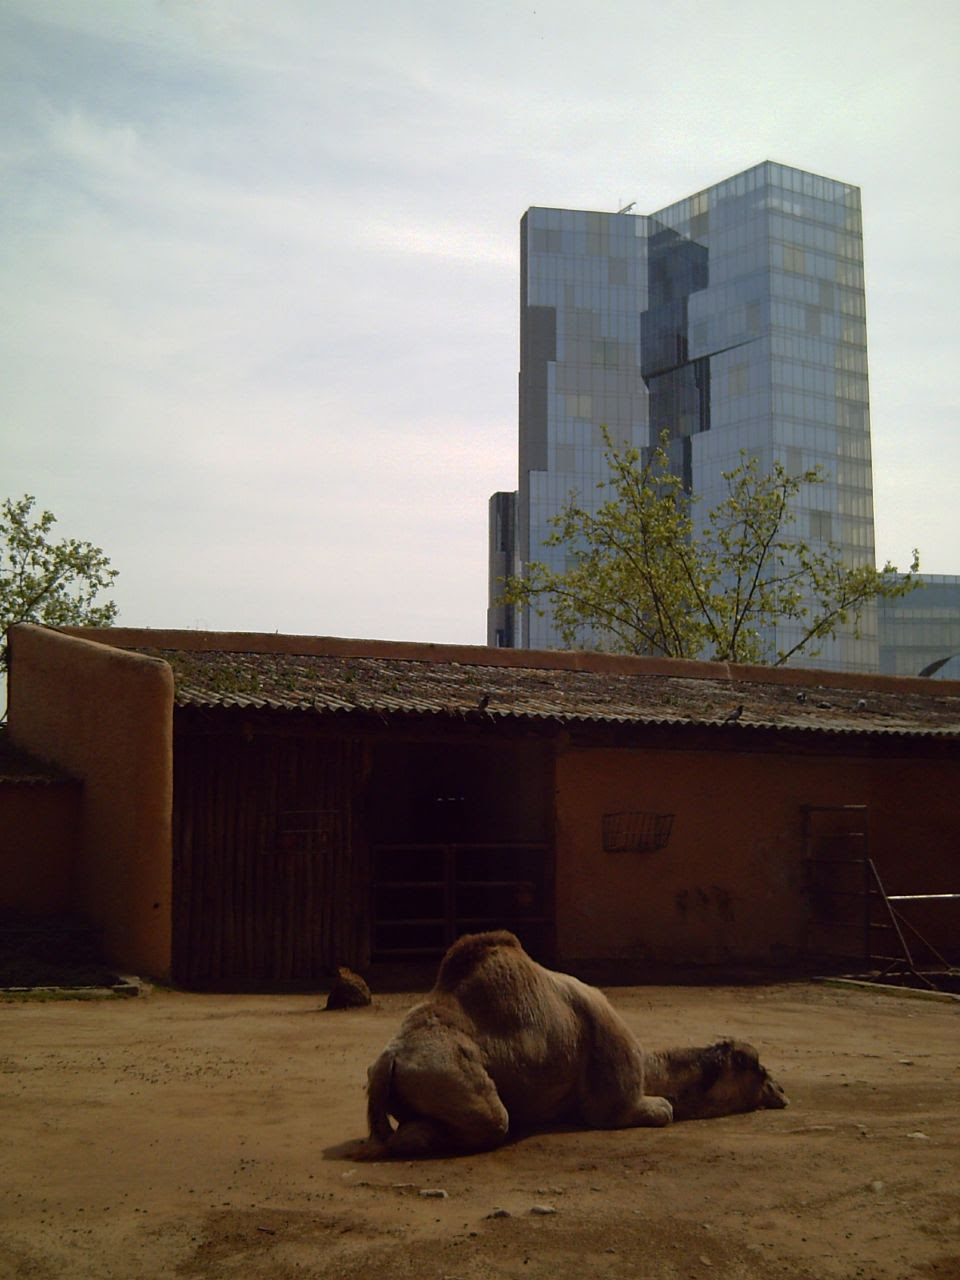 Barcelona Zoo: Dromedary Complains About the Heat